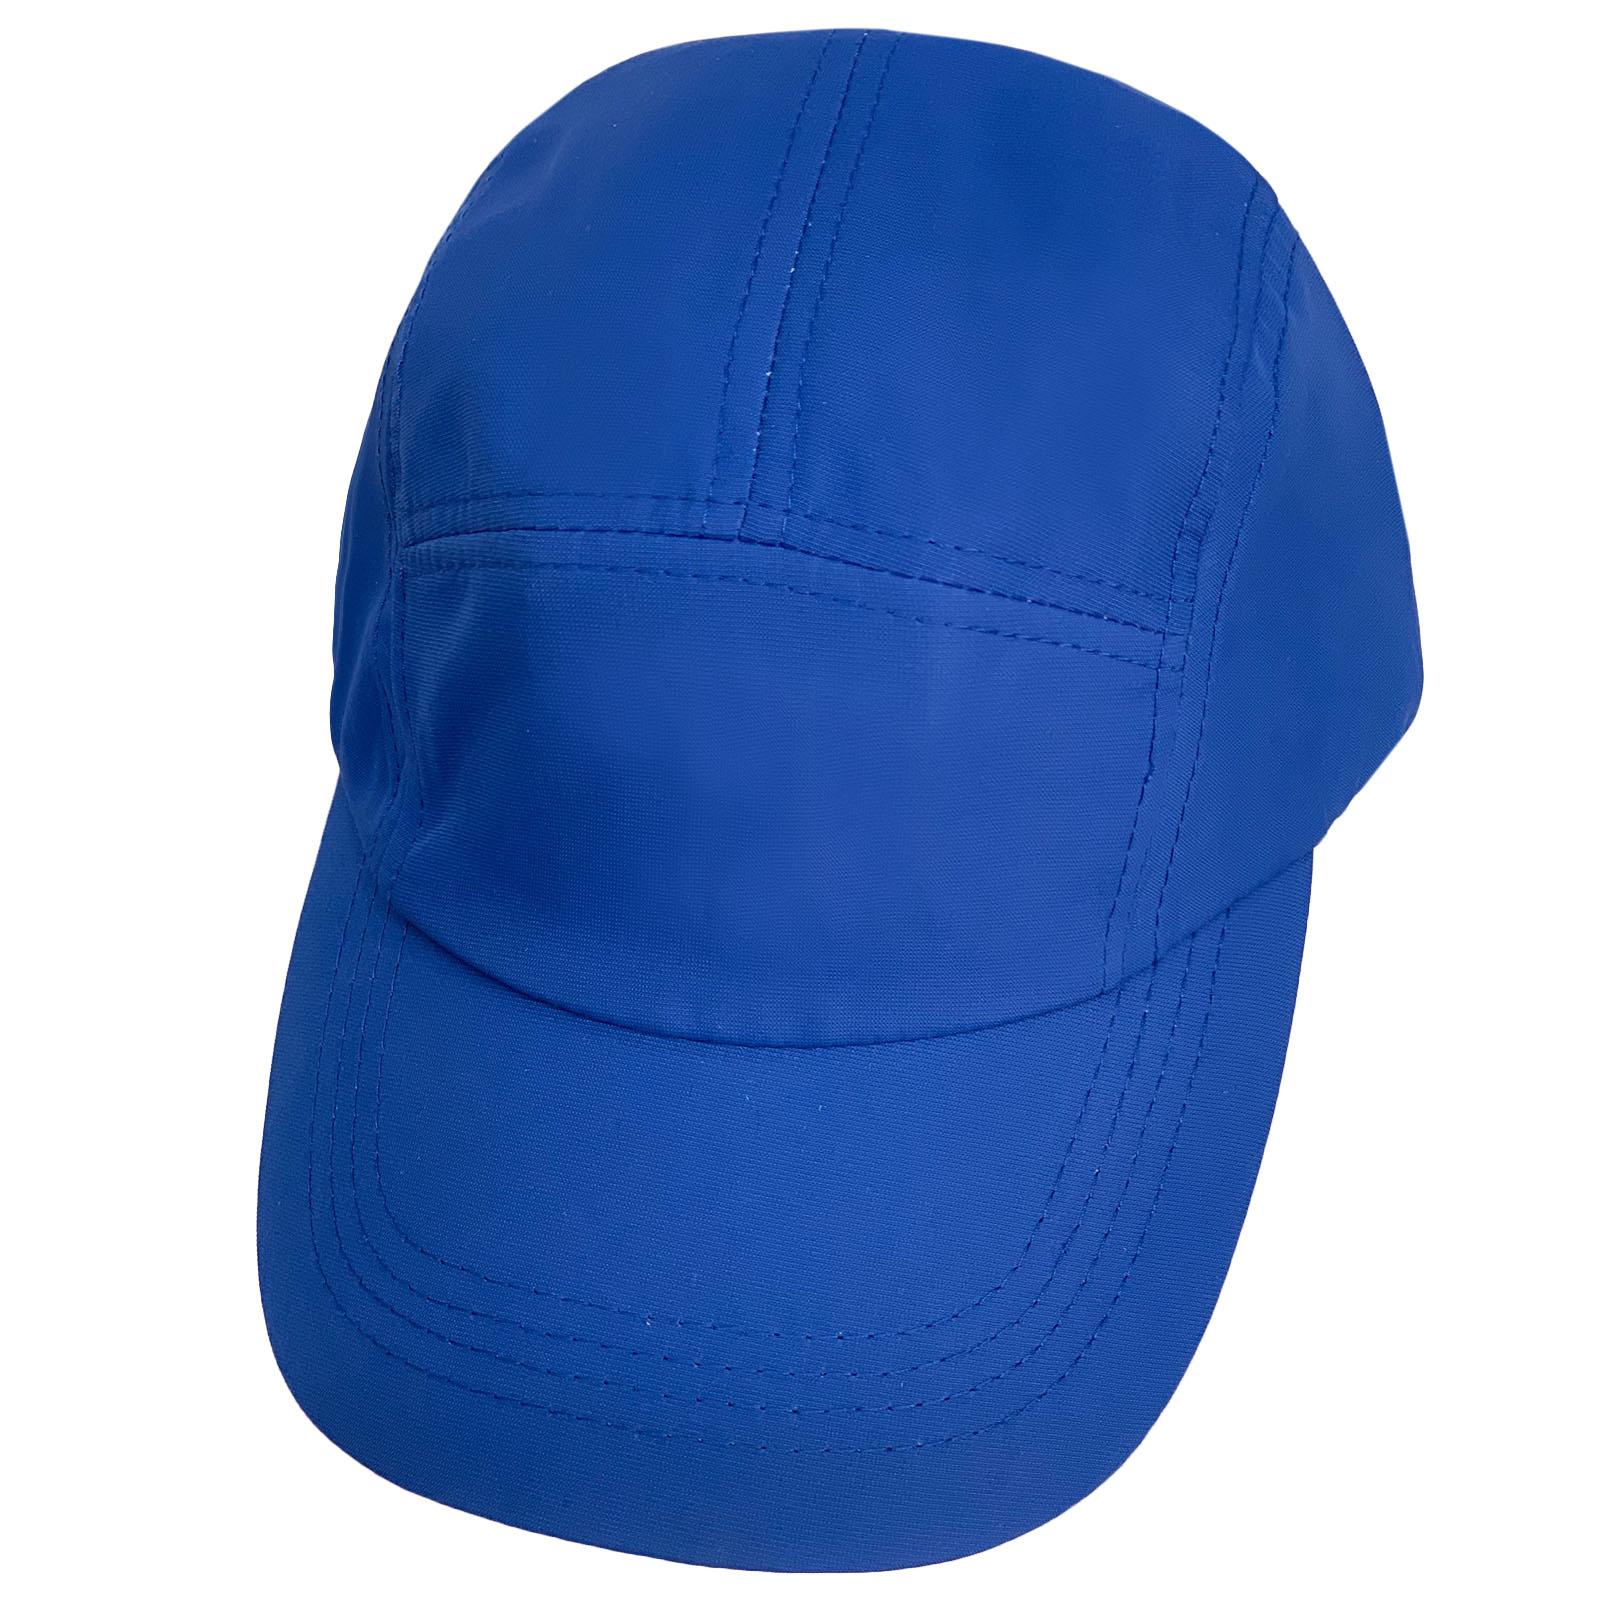 Ярко-синяя однотонная бейсболка